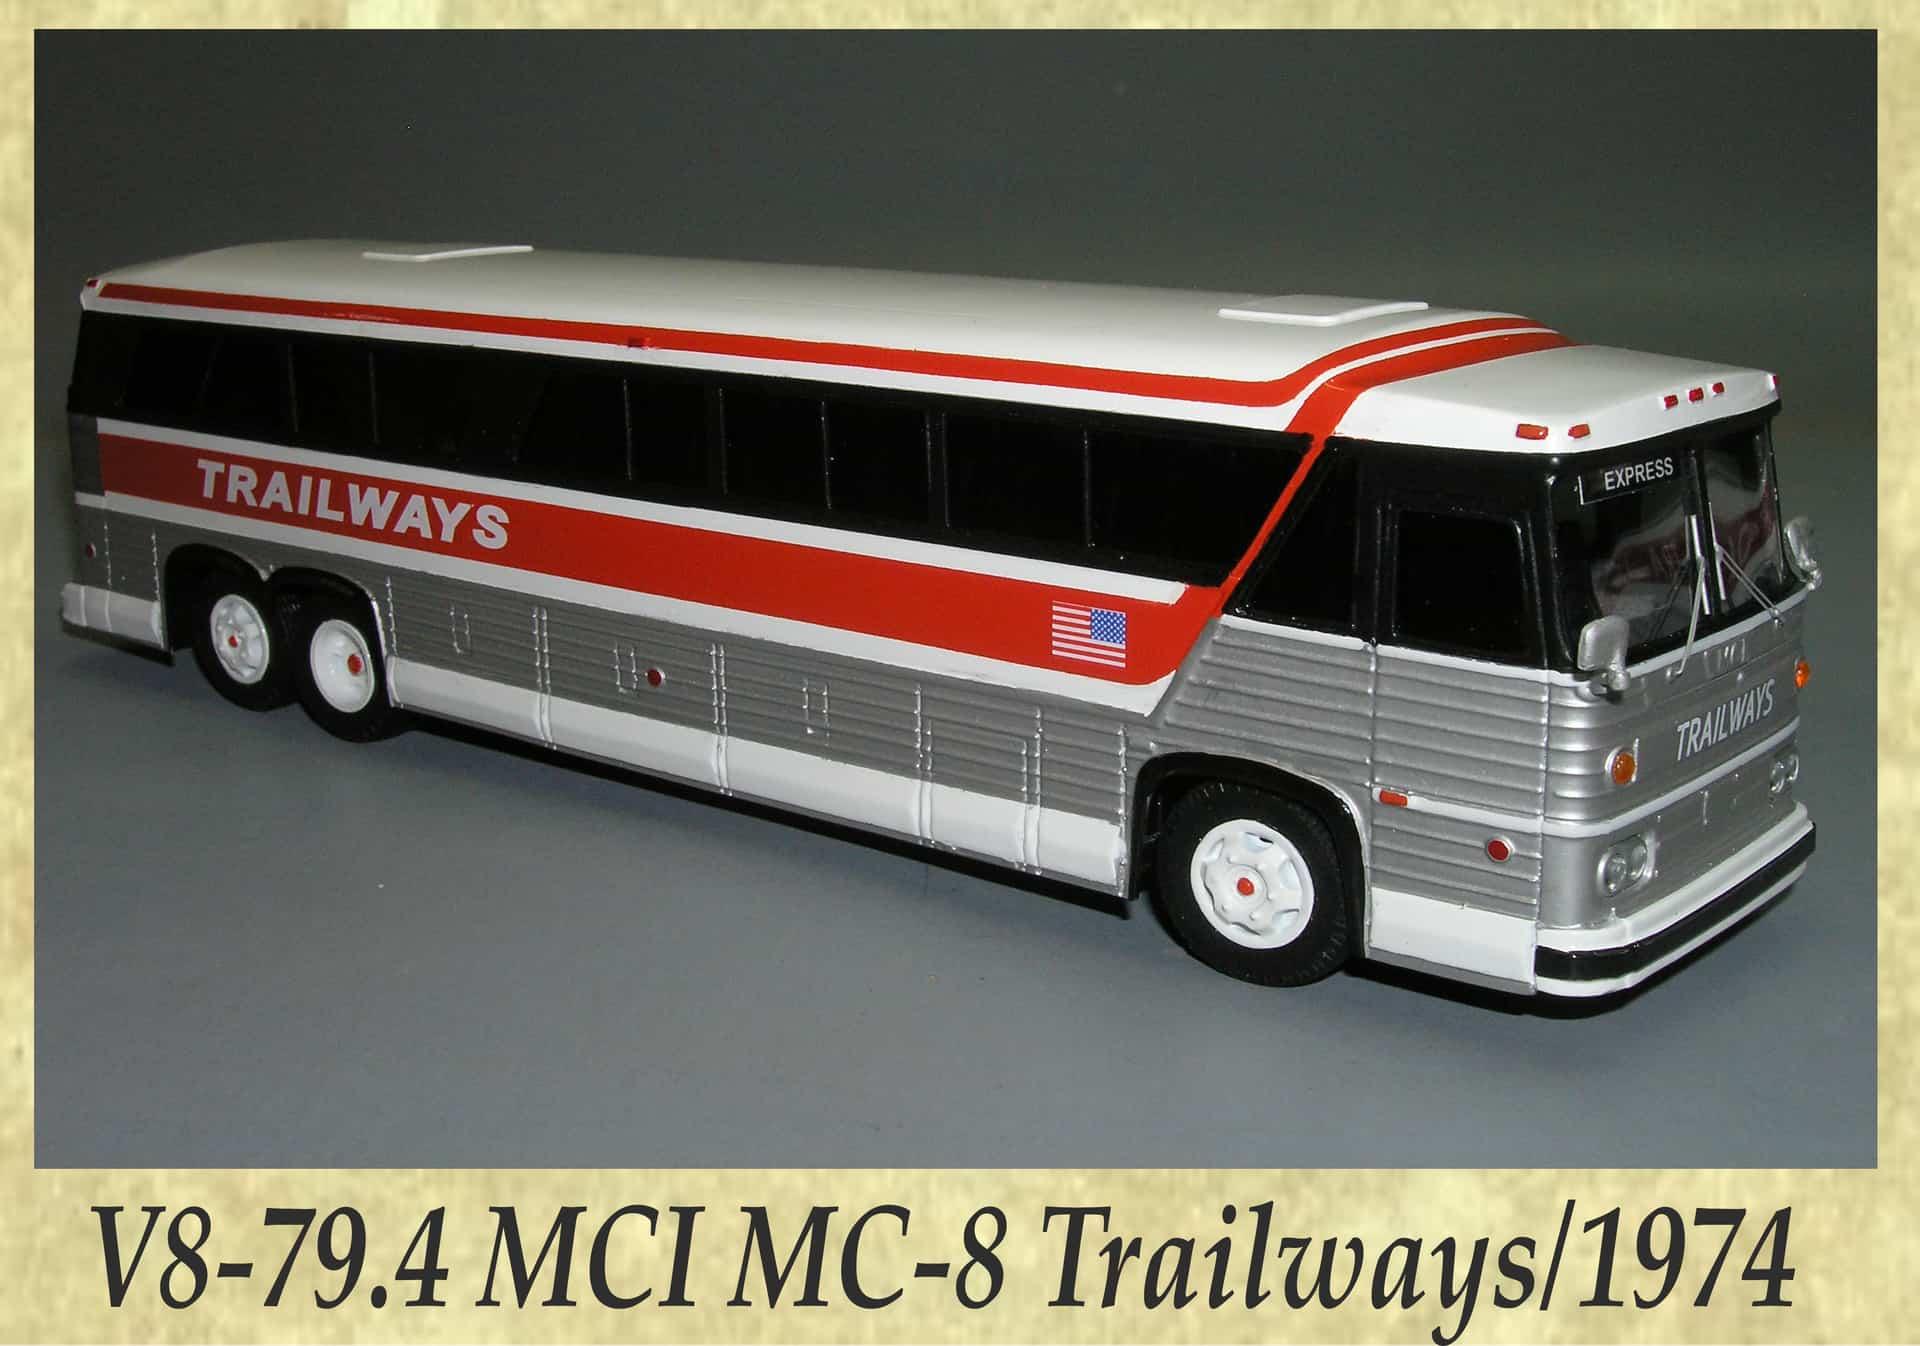 V8-79.4 MCI MC-8 Trailways 1974